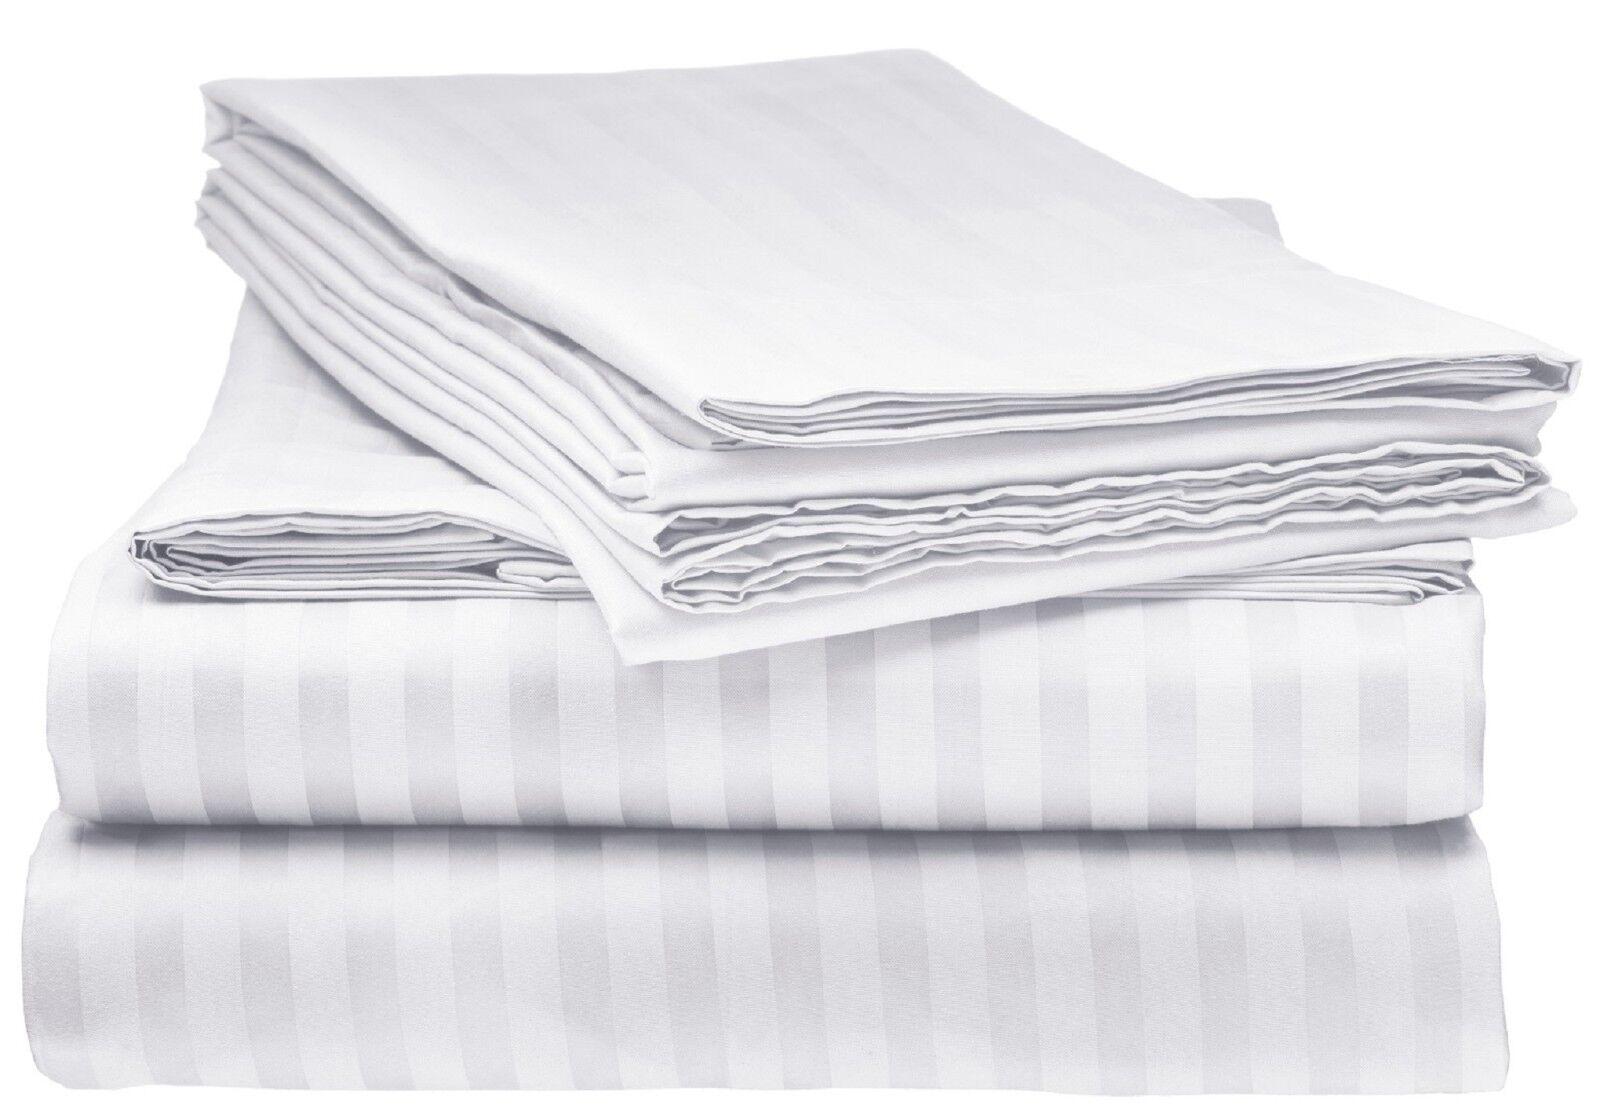 BAMBOO 1800 DEEP POCKET STRIPED BED SHEET SETS HYPOALLERGENI